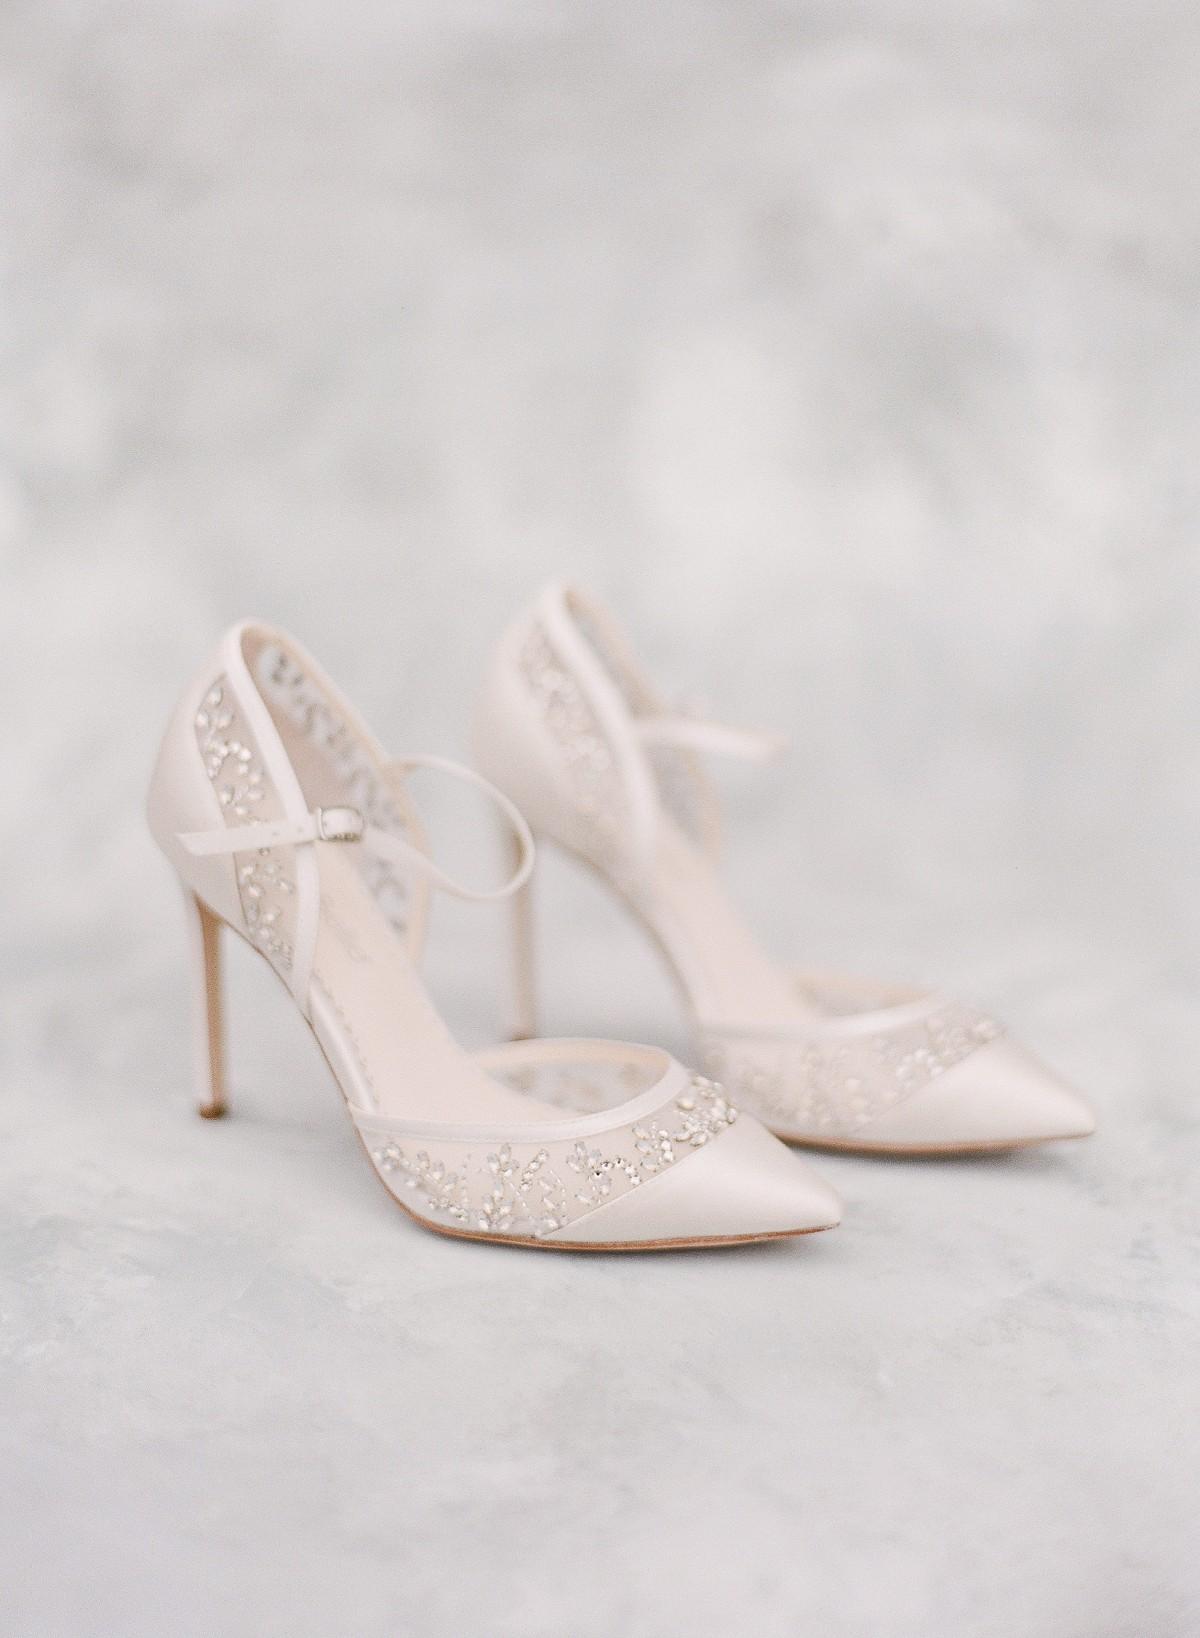 BELLA BELLE SHOES - COMFORTABLE WEDDING SHOES